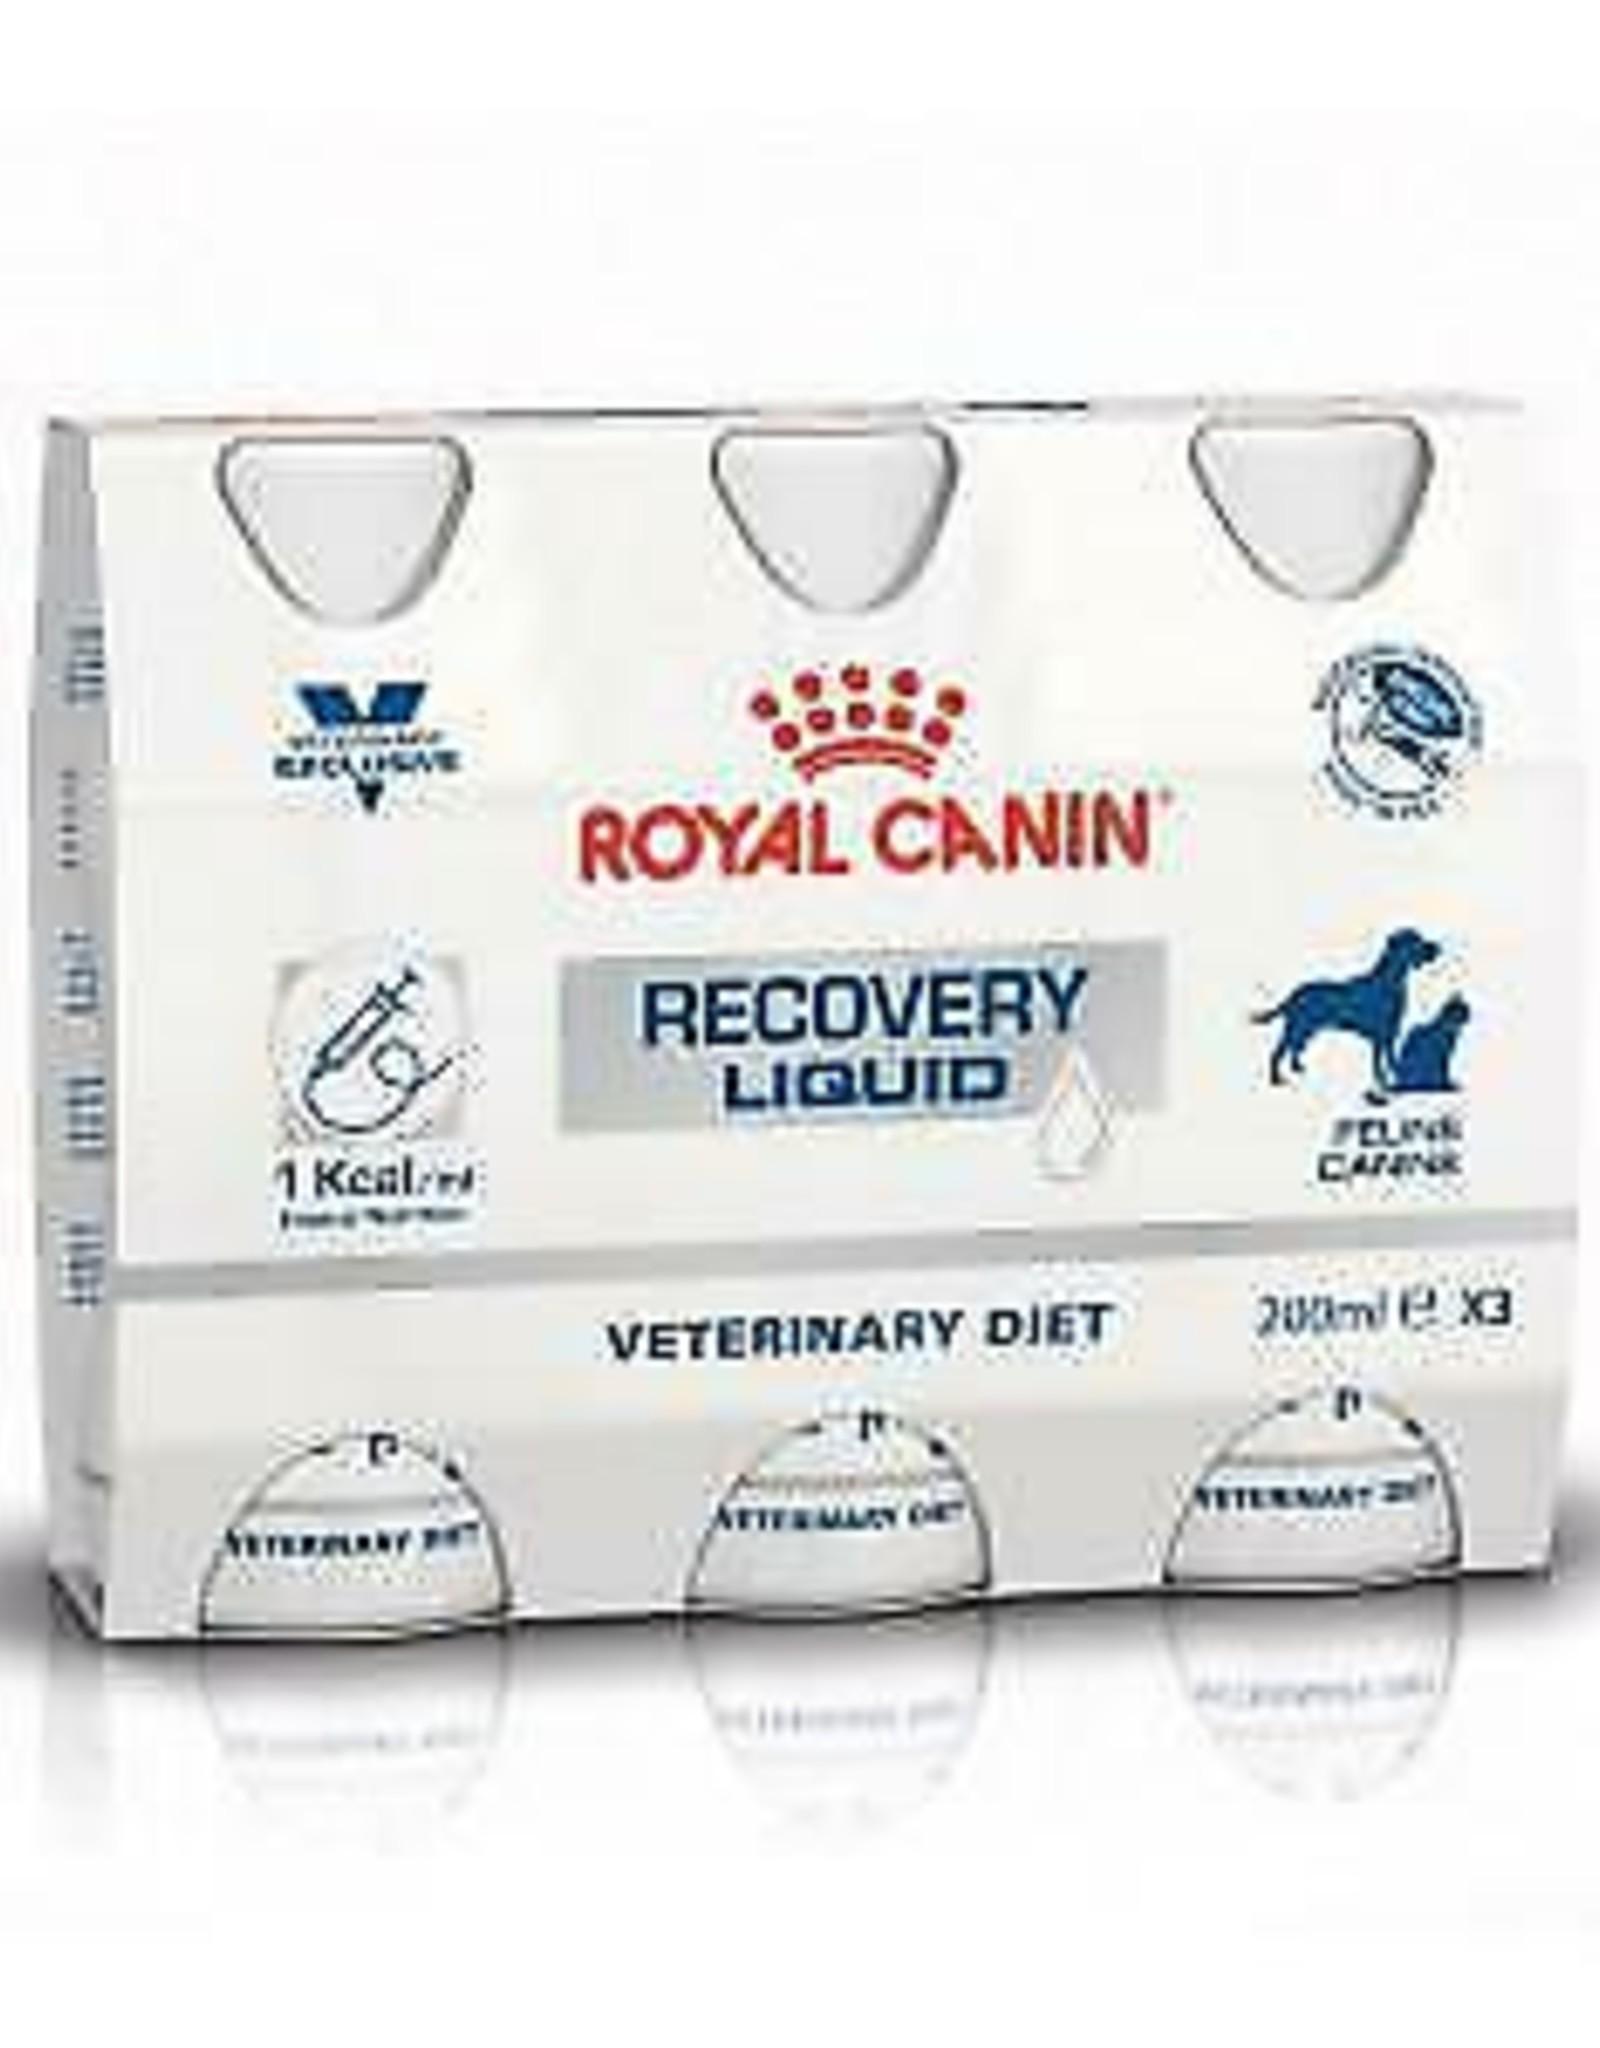 Royal Canin Royal Canin Recovery Liquid Hond/kat 3x200ml